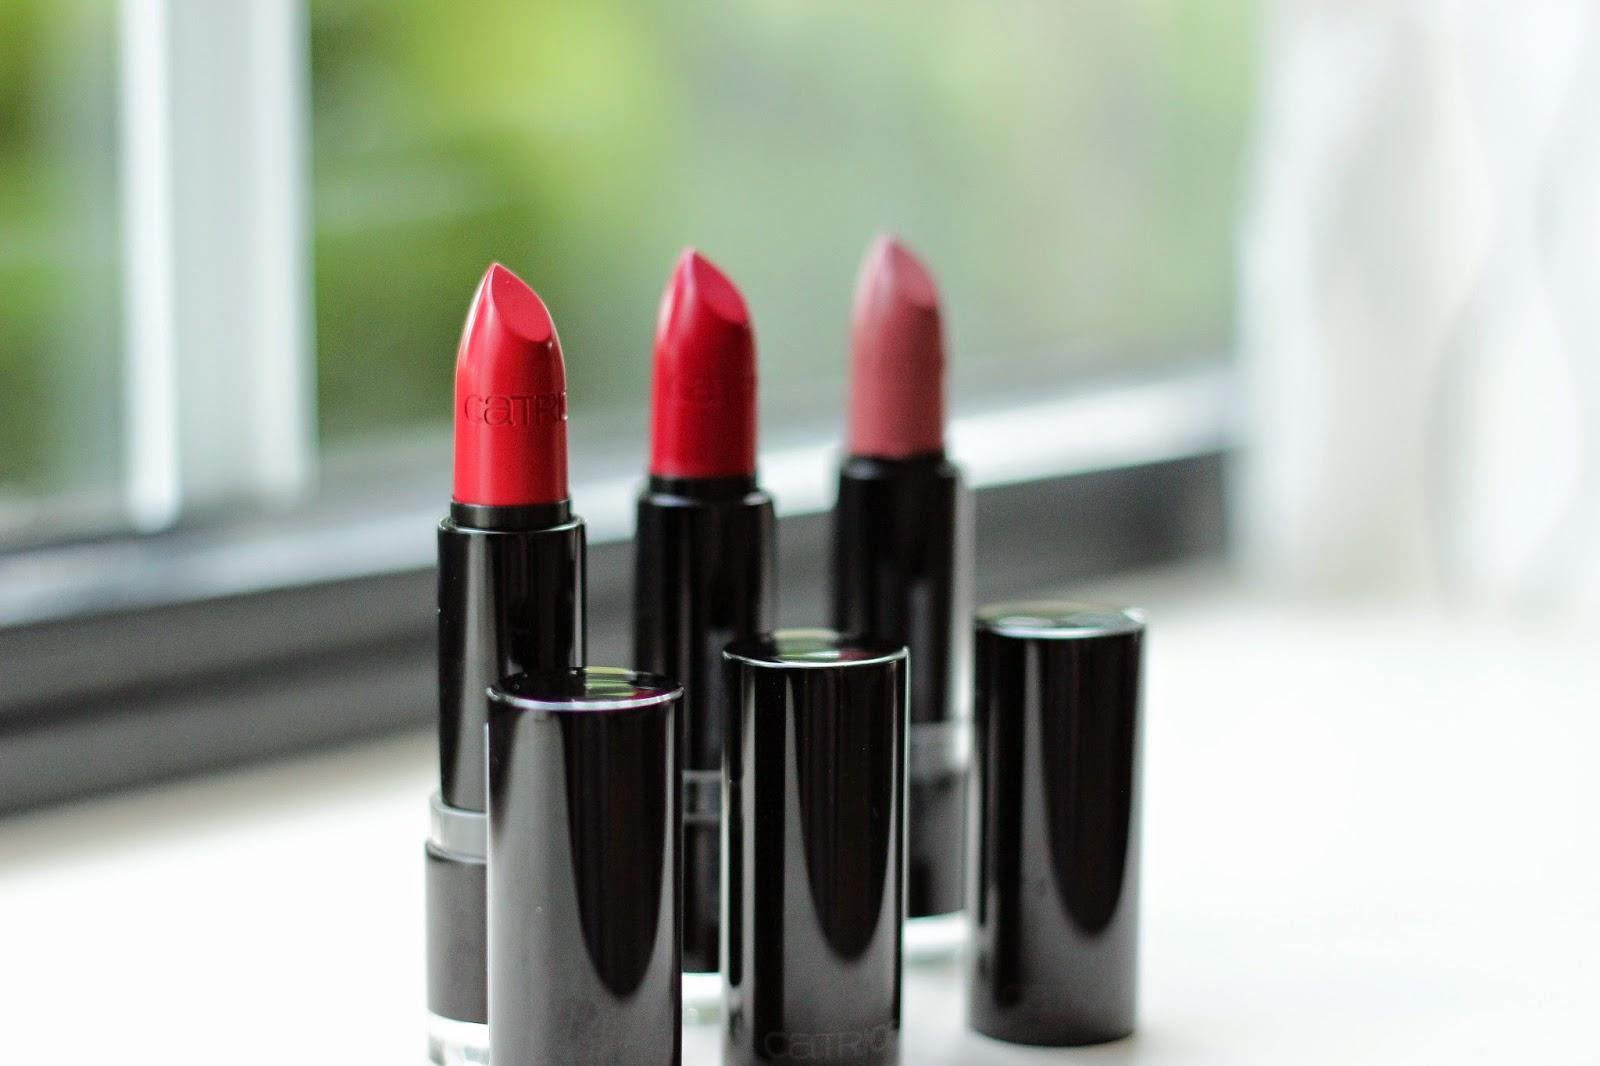 catrice ultimate colour lipstick MATTador MATTraction In A Rosegarden